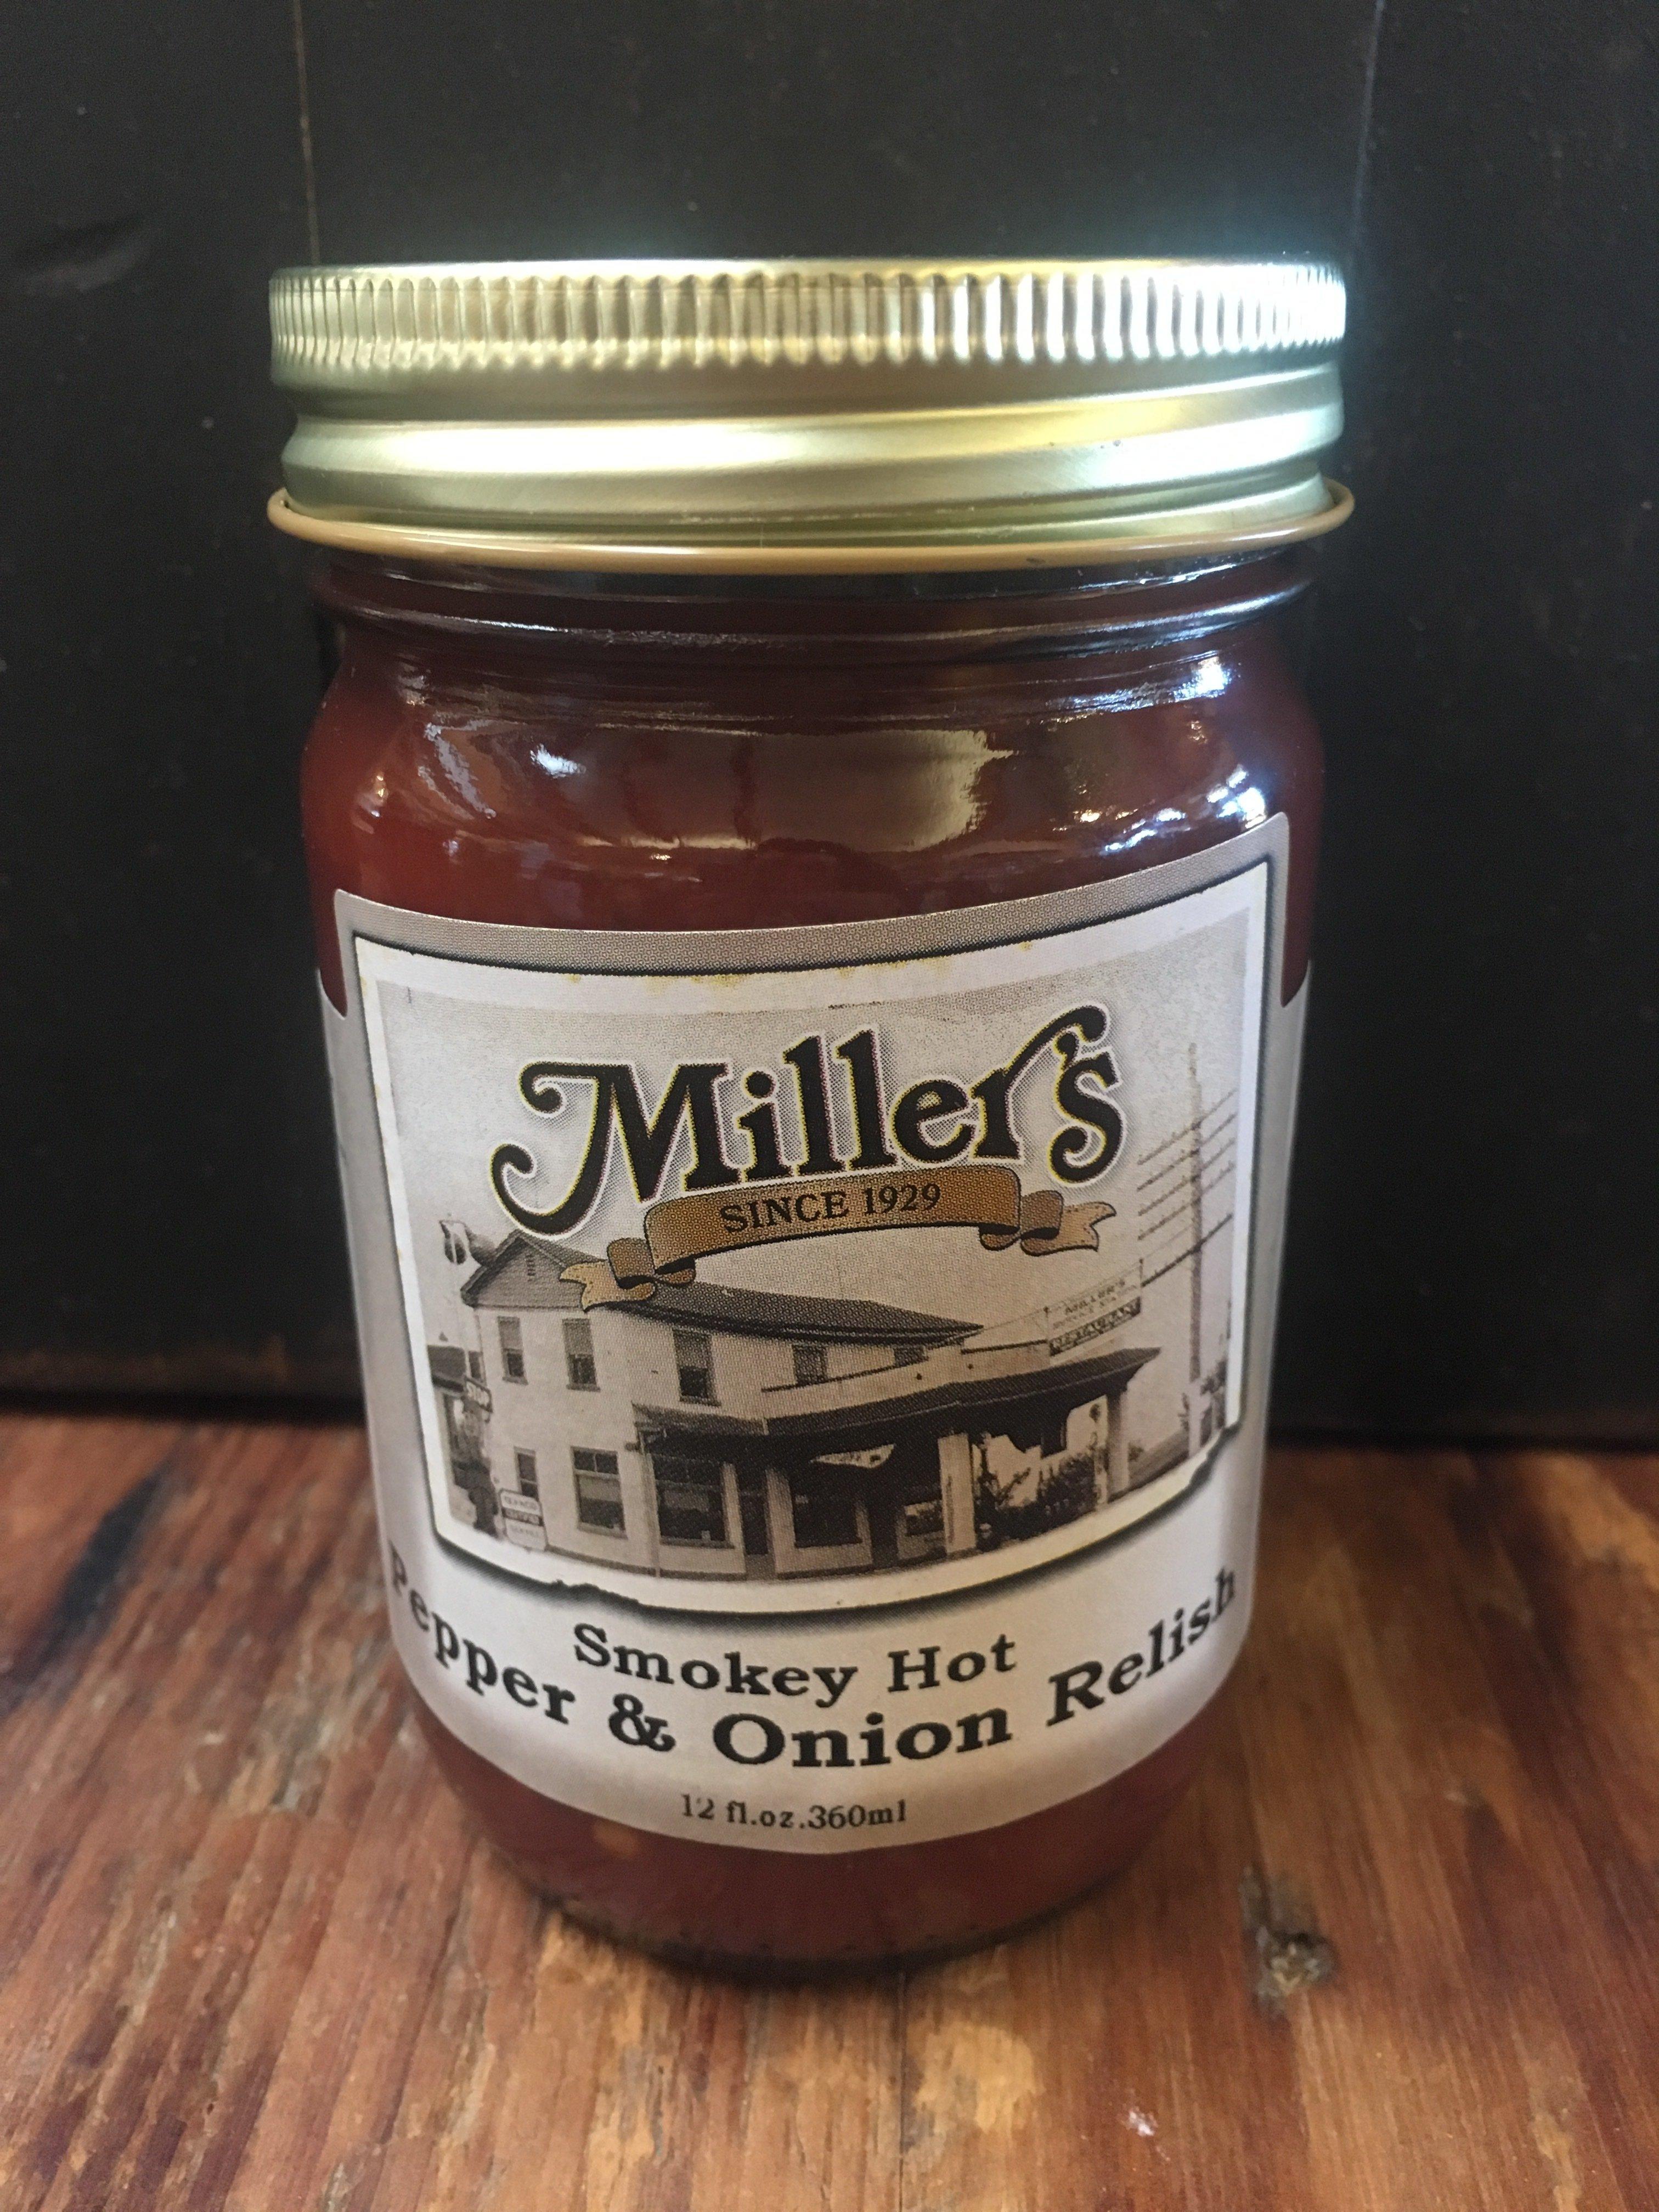 Smokey Hot Pepper & Onion Relish 12oz 00038